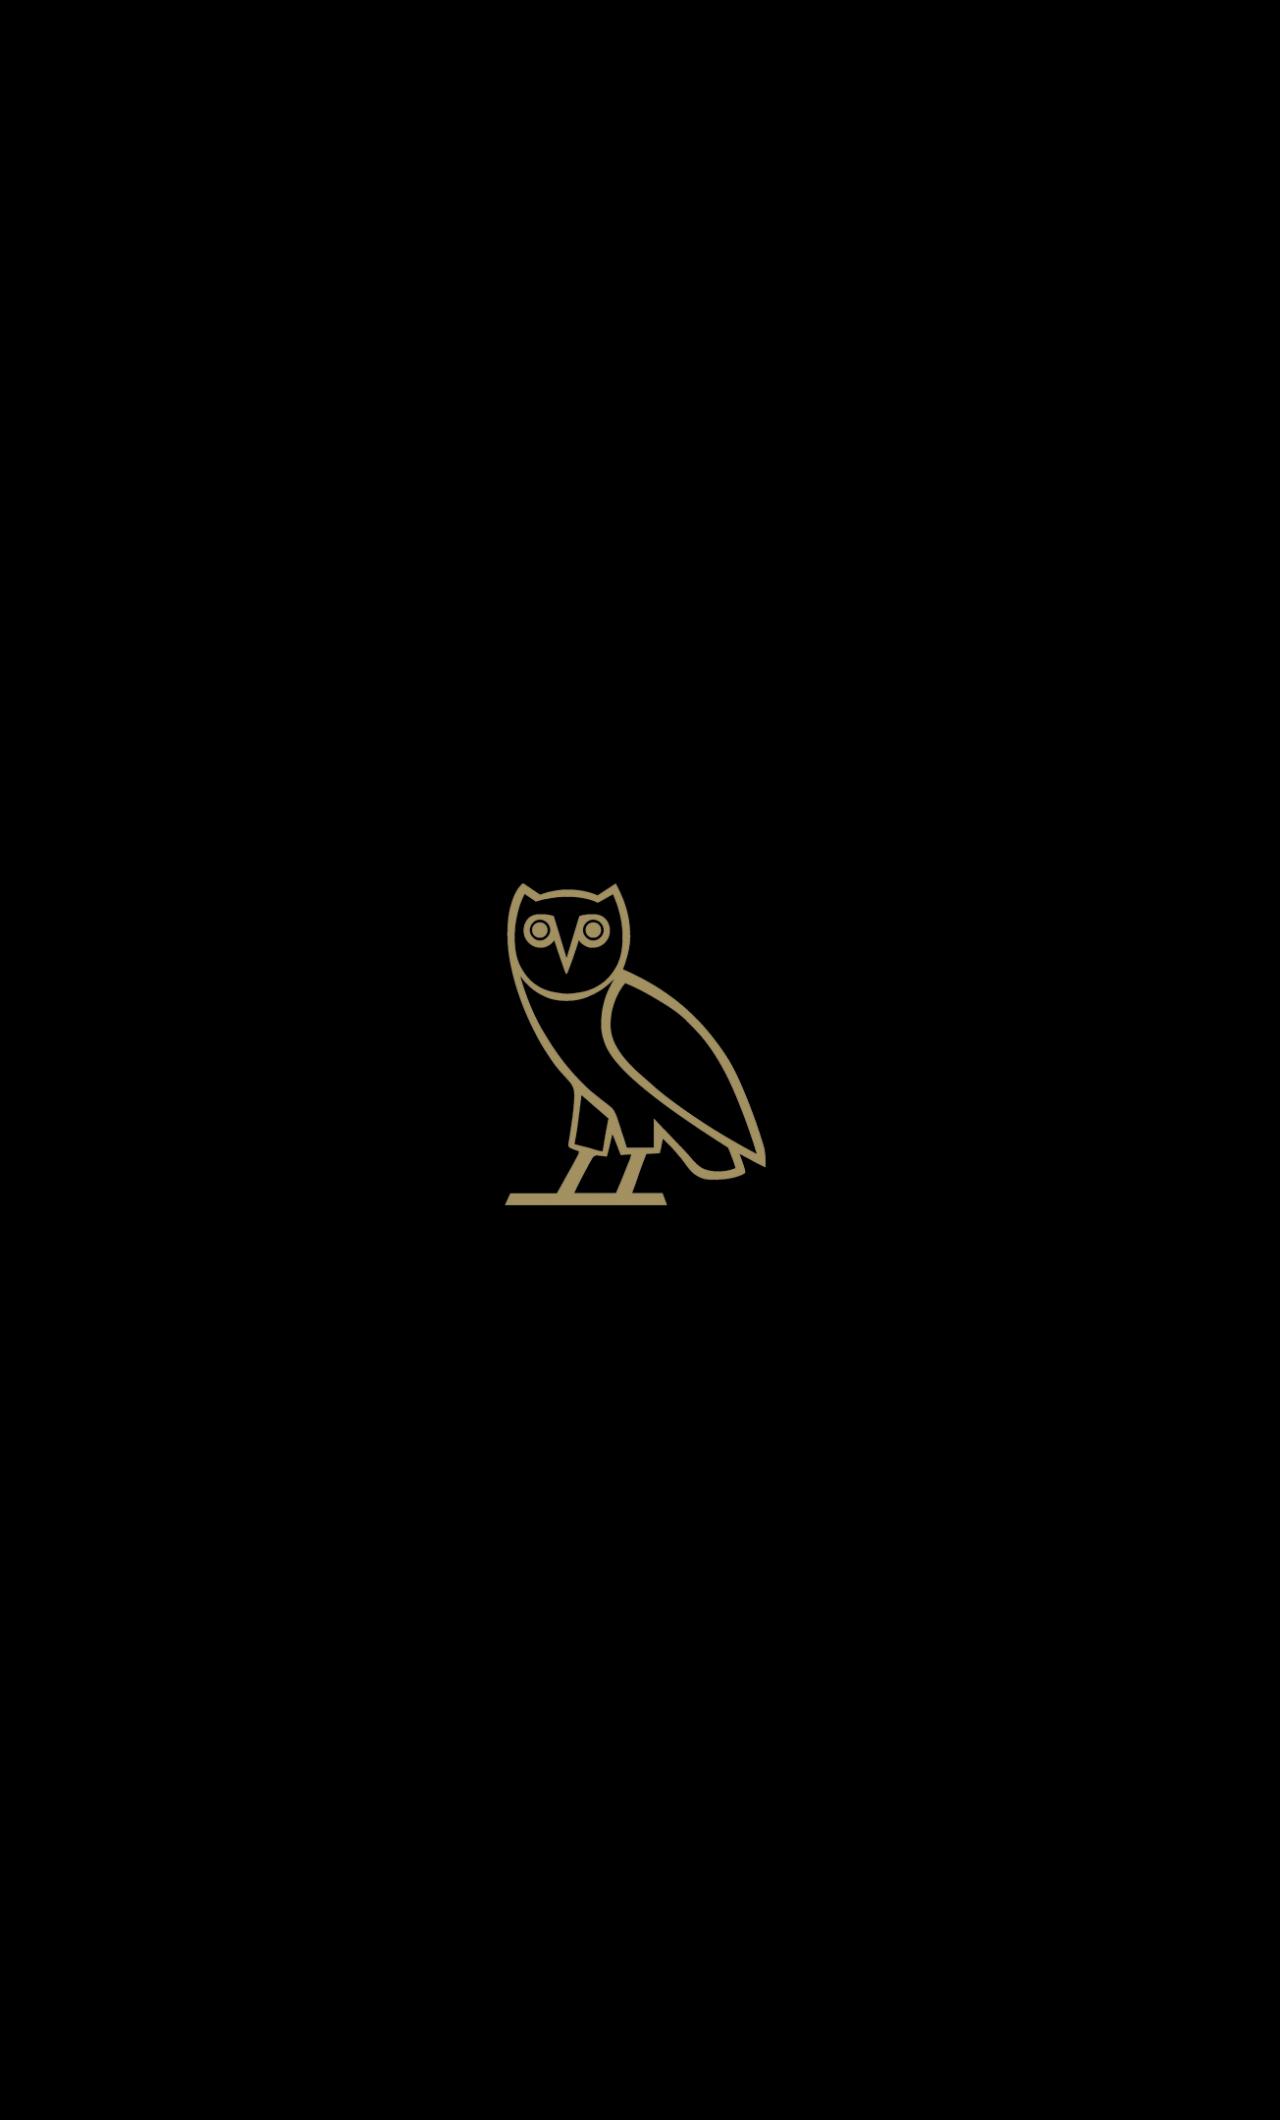 Download 1280x2120 Wallpaper Owl Bird Minimal Dark I